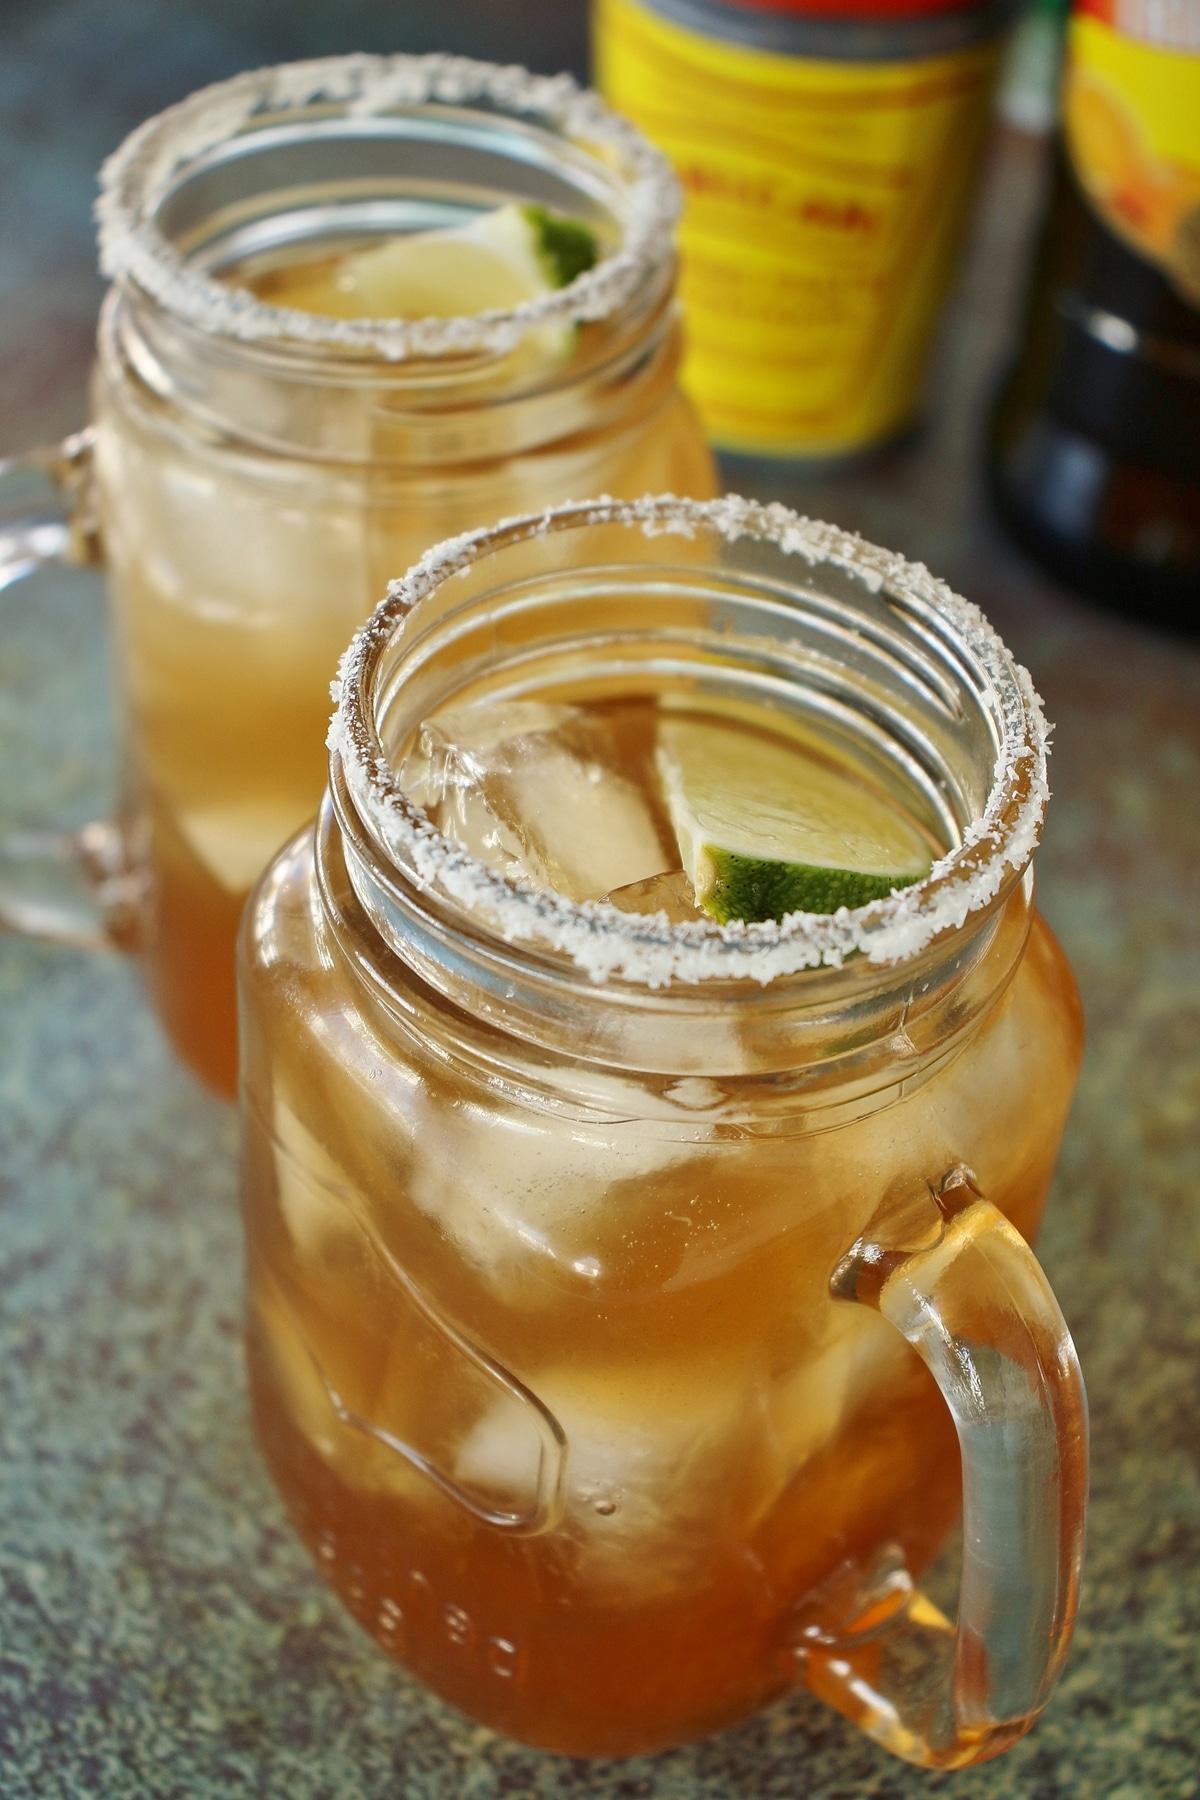 2 tamarind margaritas with salt rims and lime wedge garnish, served in mason jar mugs